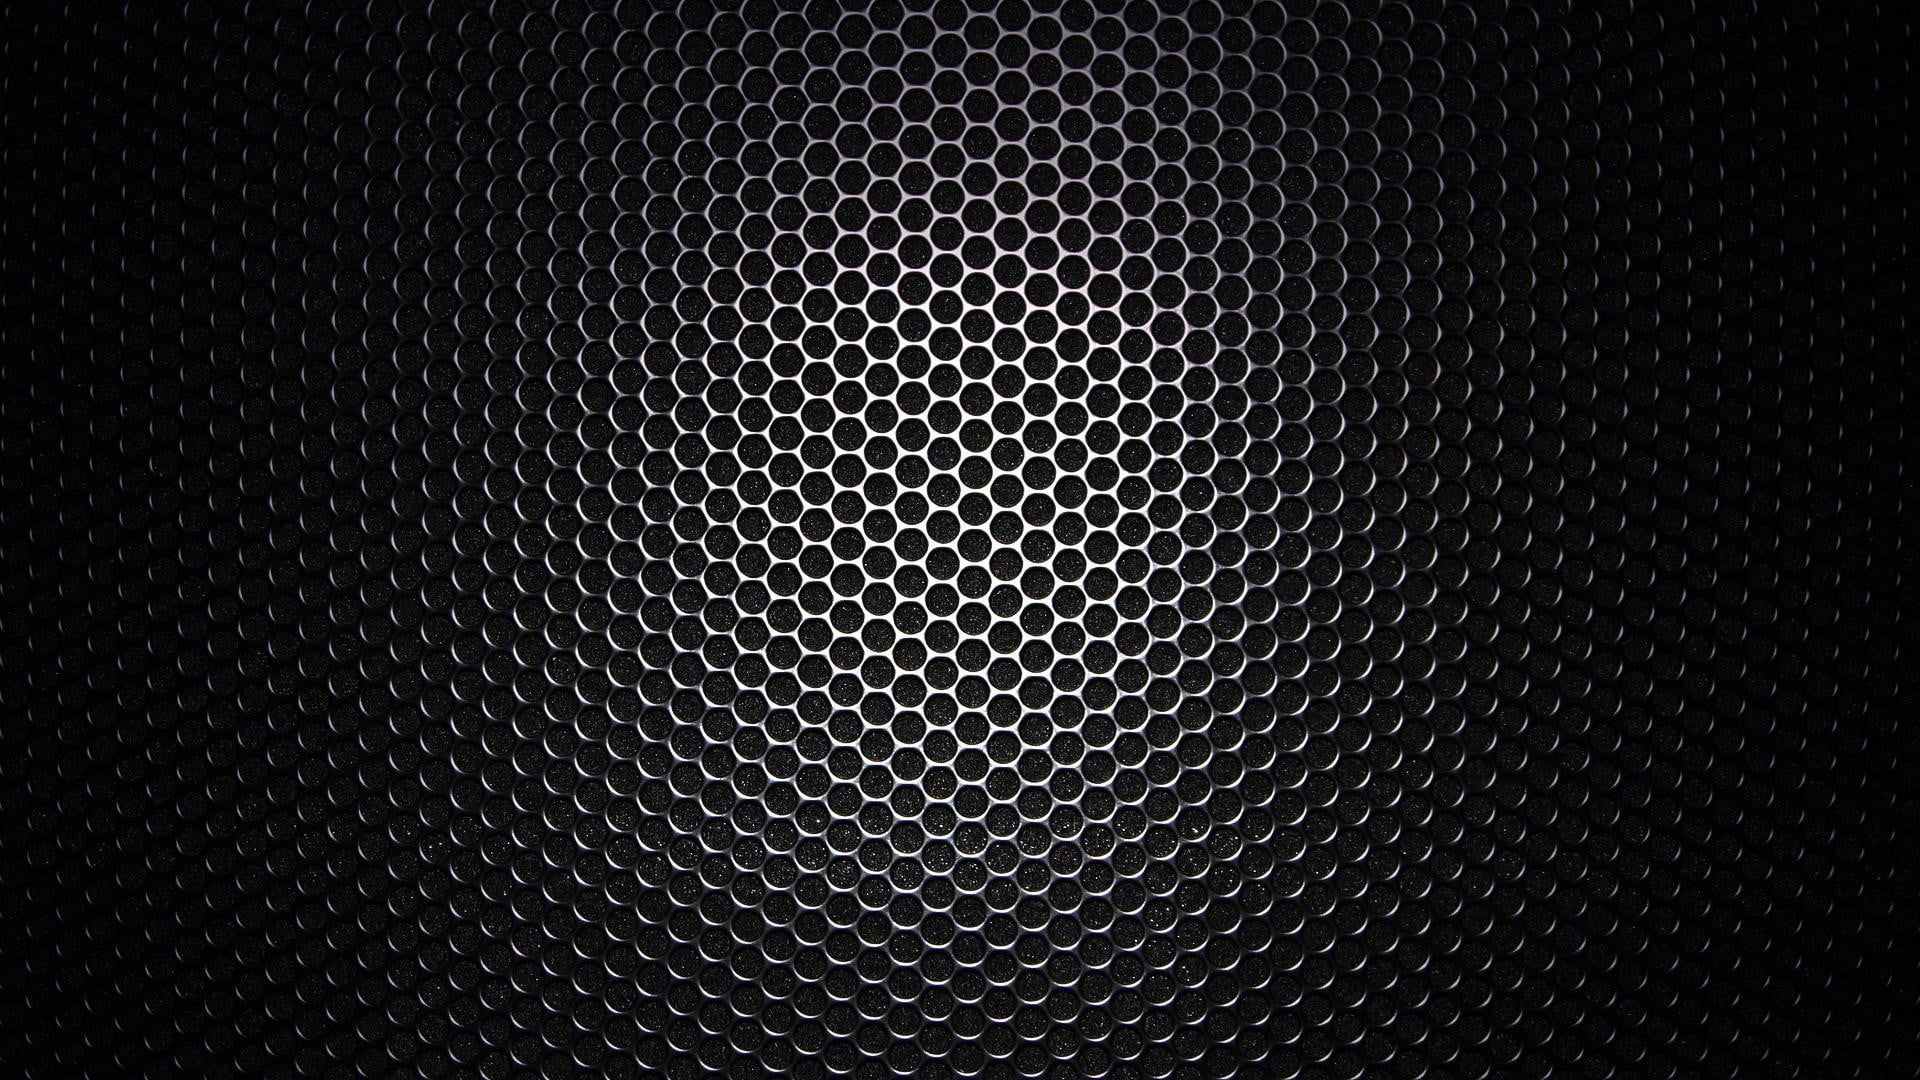 Black Metal Mesh Black Texture Gradient 1080p Wallpaper Hdwallpaper Desktop Black Wallpaper Iphone Wallpaper Images Black Wallpaper Iphone